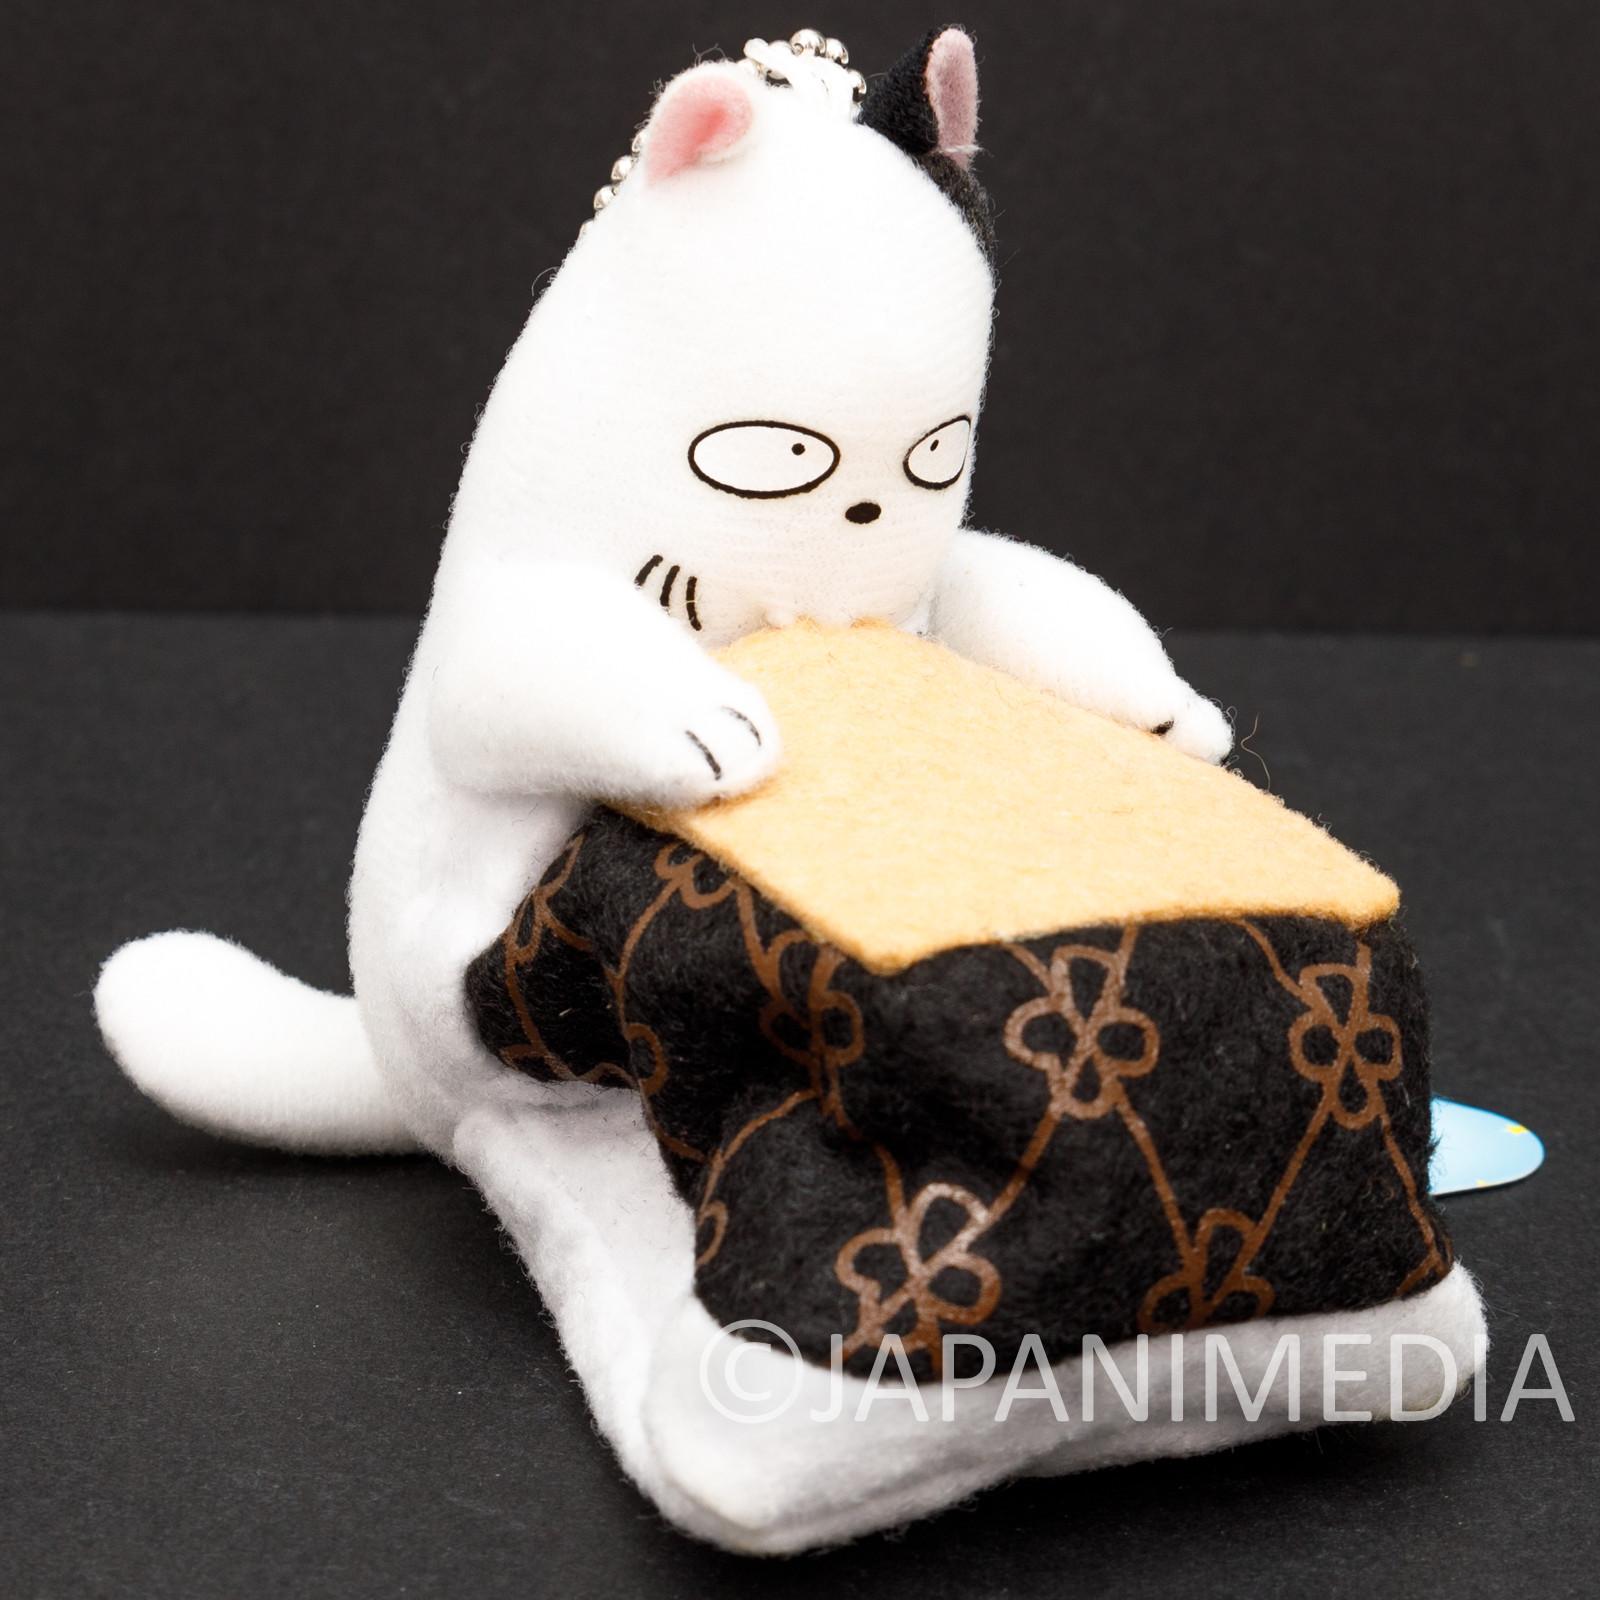 Urusei Yatsura Kotatsu Neko Cat Plush Doll Ballchain JAPAN RUMIKO TAKAHASHI